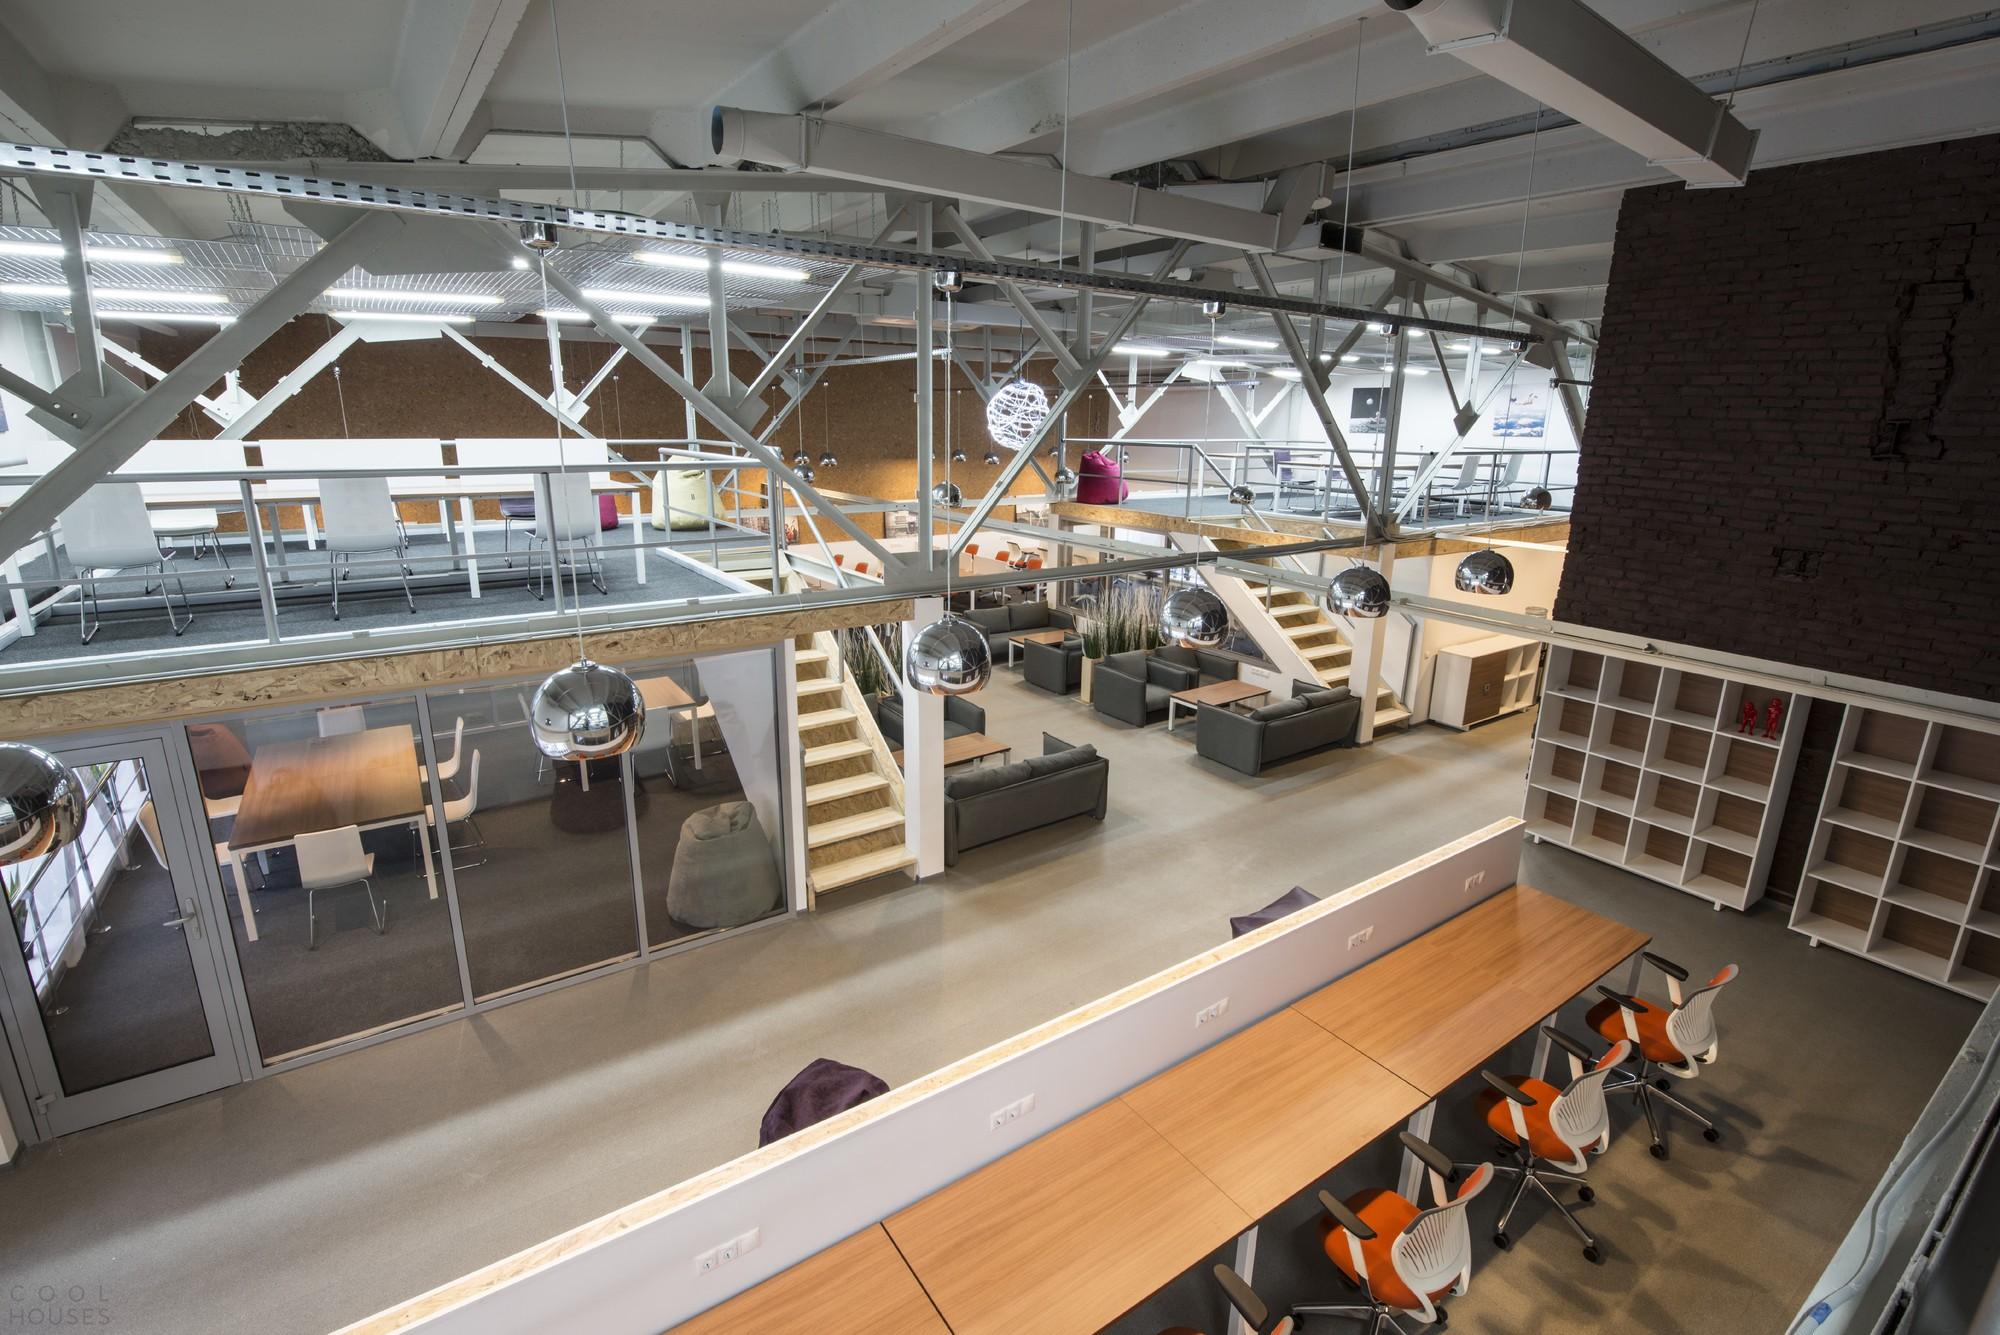 Дизайн современного коворкинг центра Нагатино 2.0